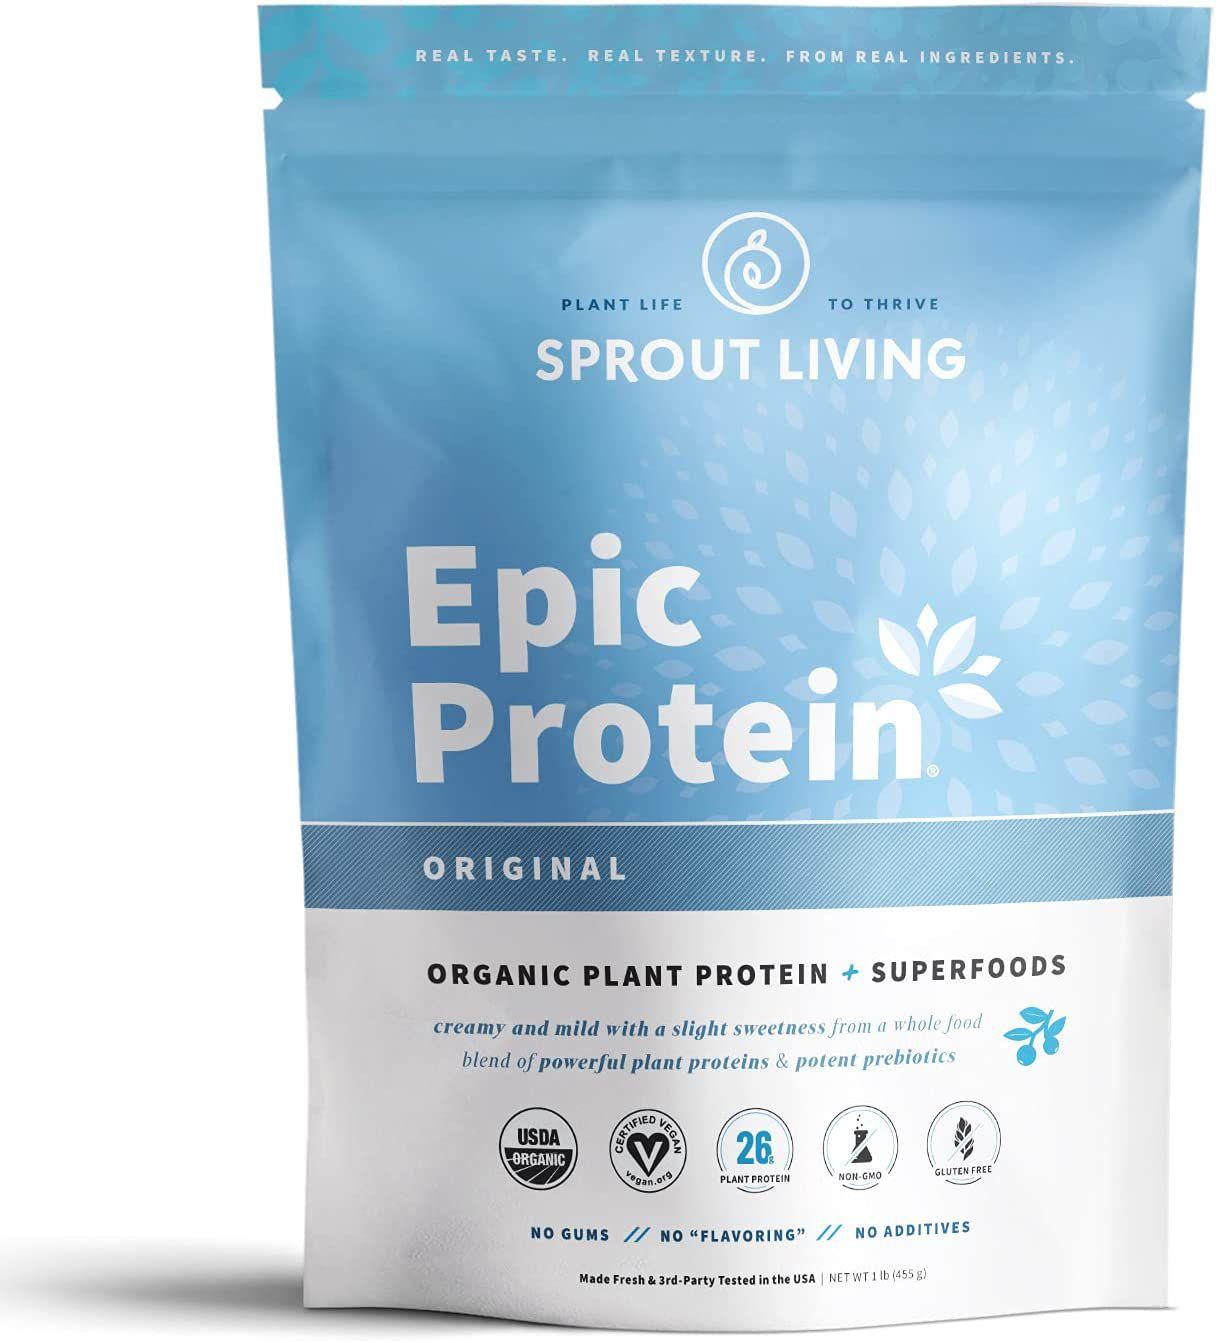 Sprout Living Epic Protein Powder Original Flavor